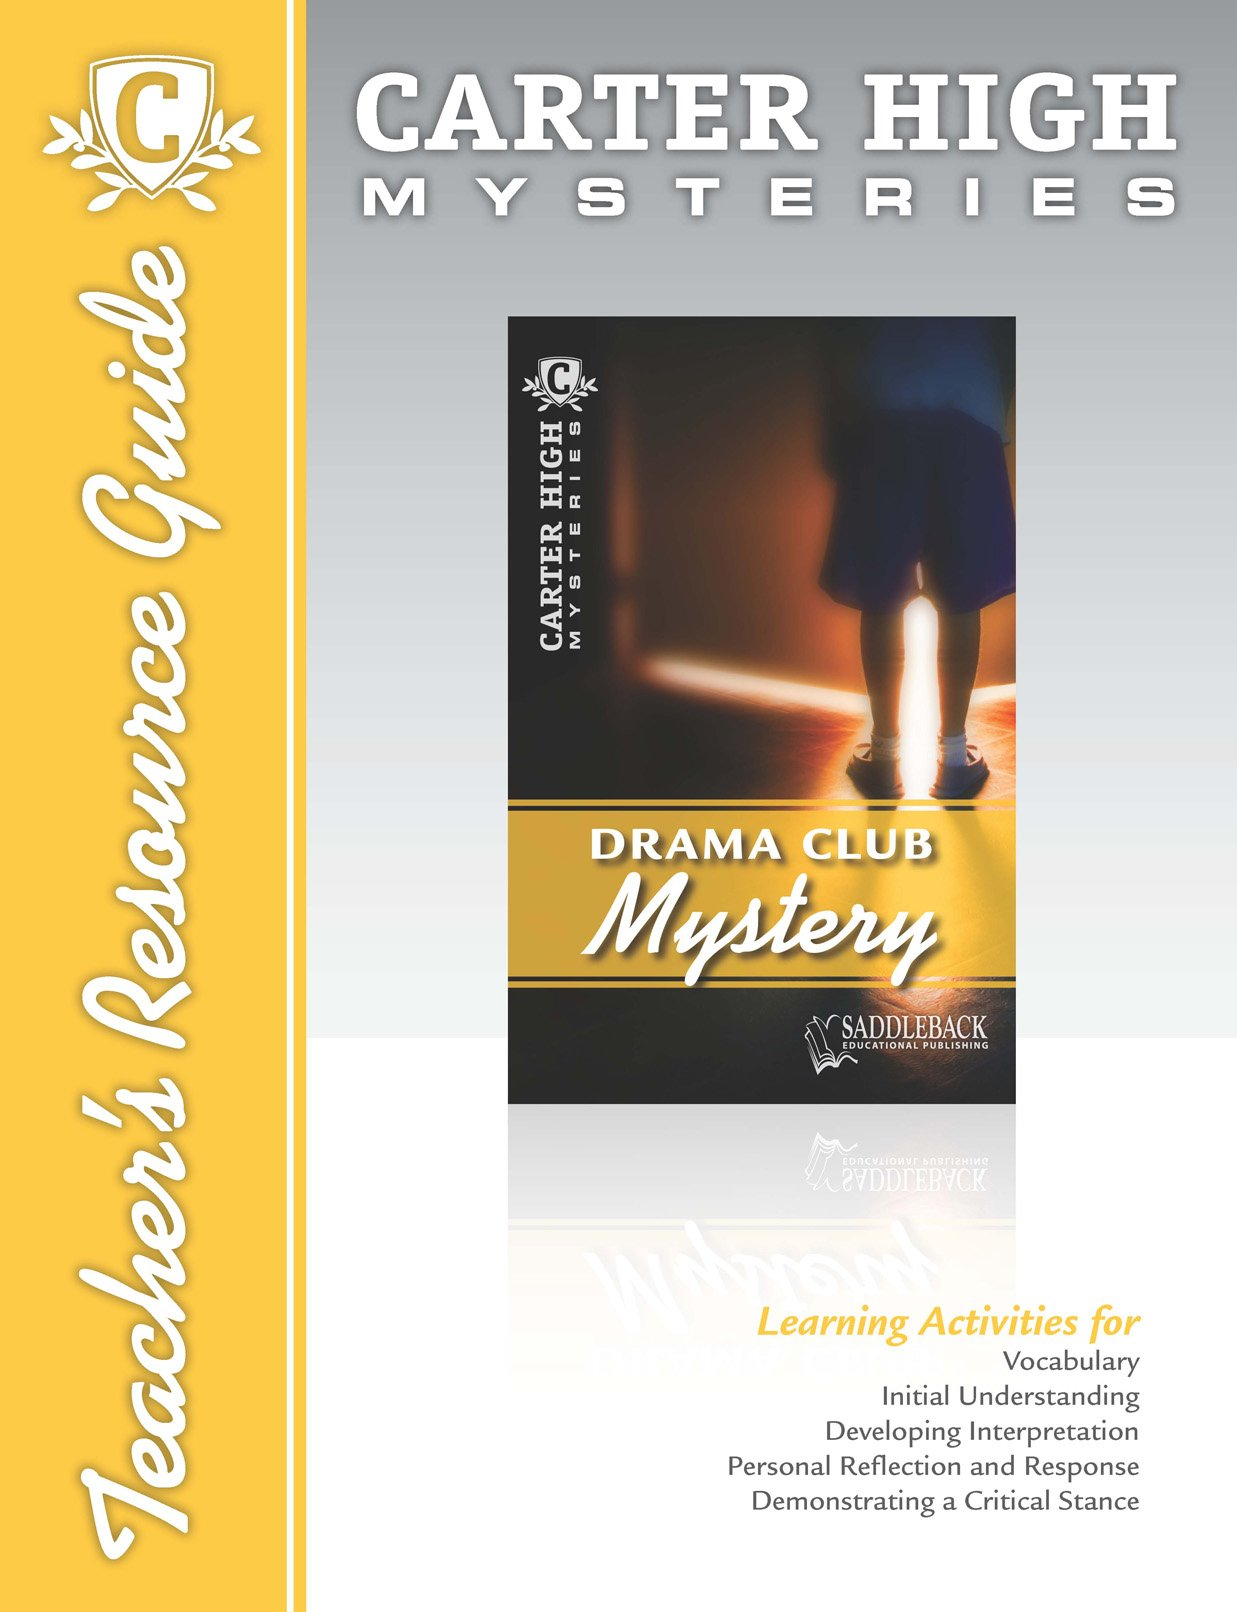 Drama Club Mystery Teachers Resource Guide CD (Carter High Mysteries)